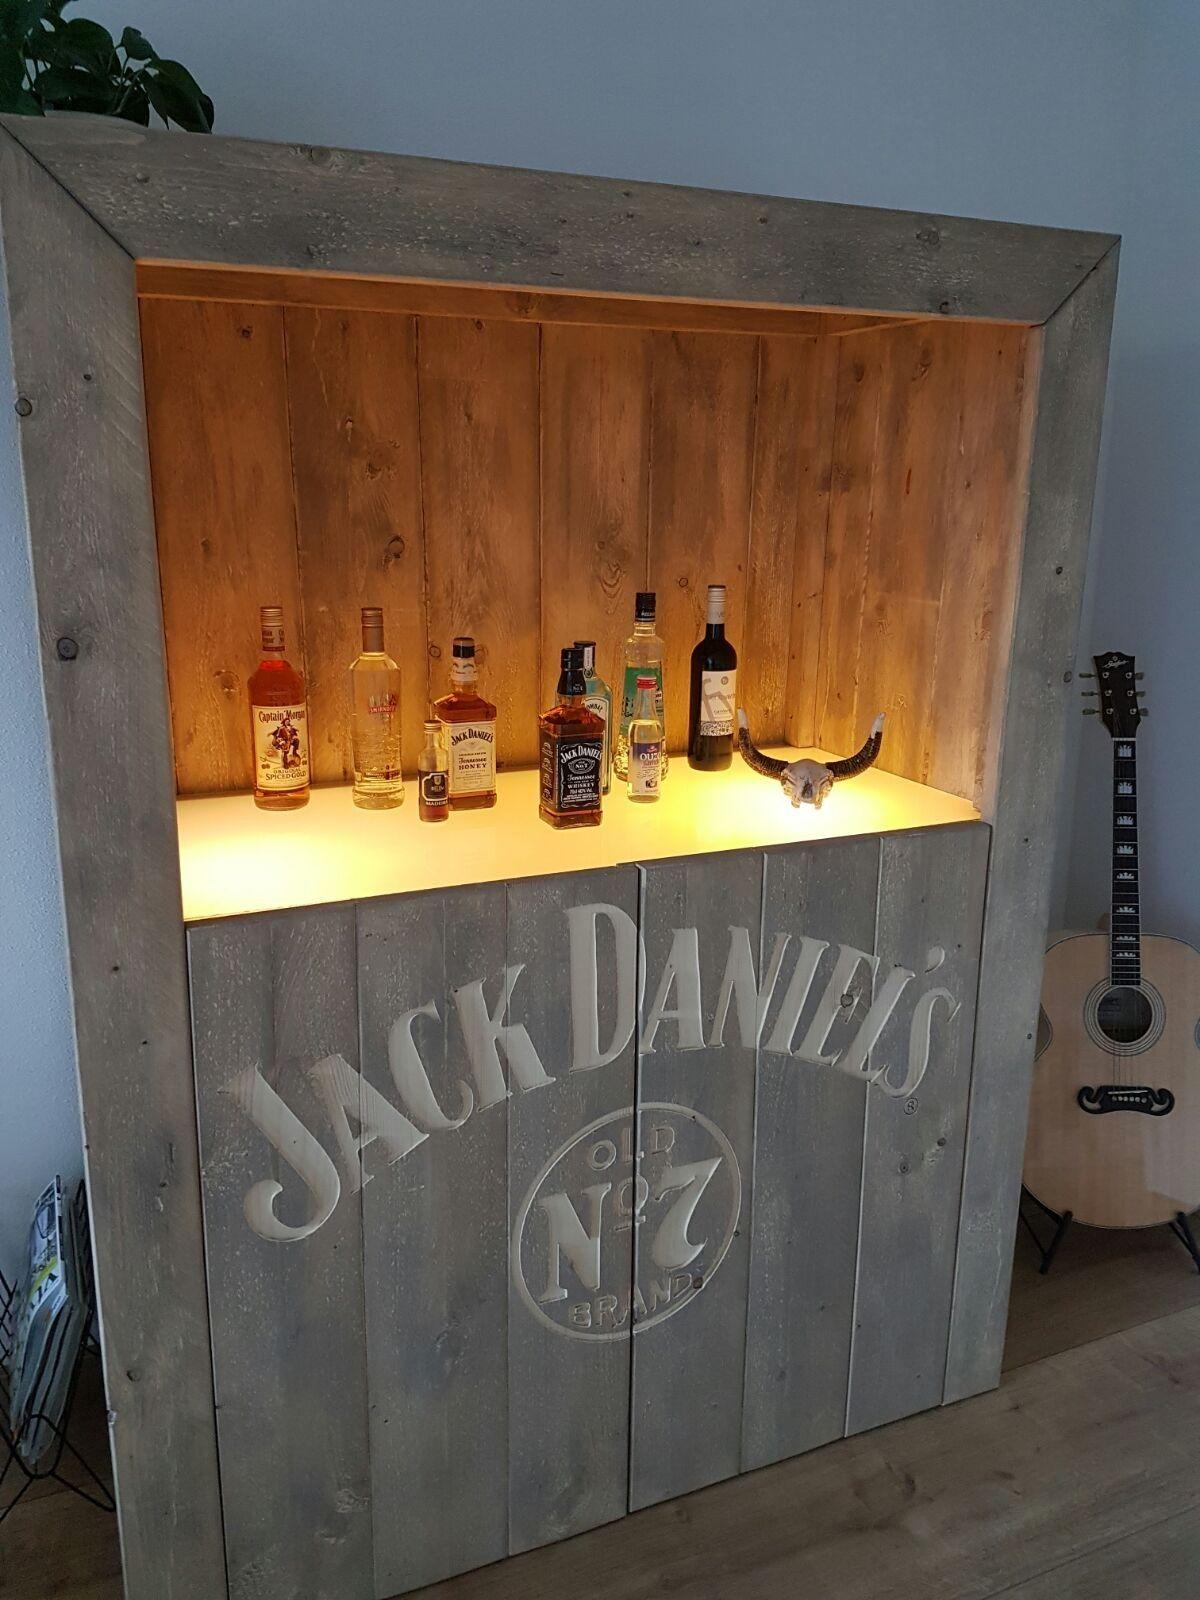 Jack Daniels Drankenkast Home Deco In 2019 Bar Ideen Bar Und Deko